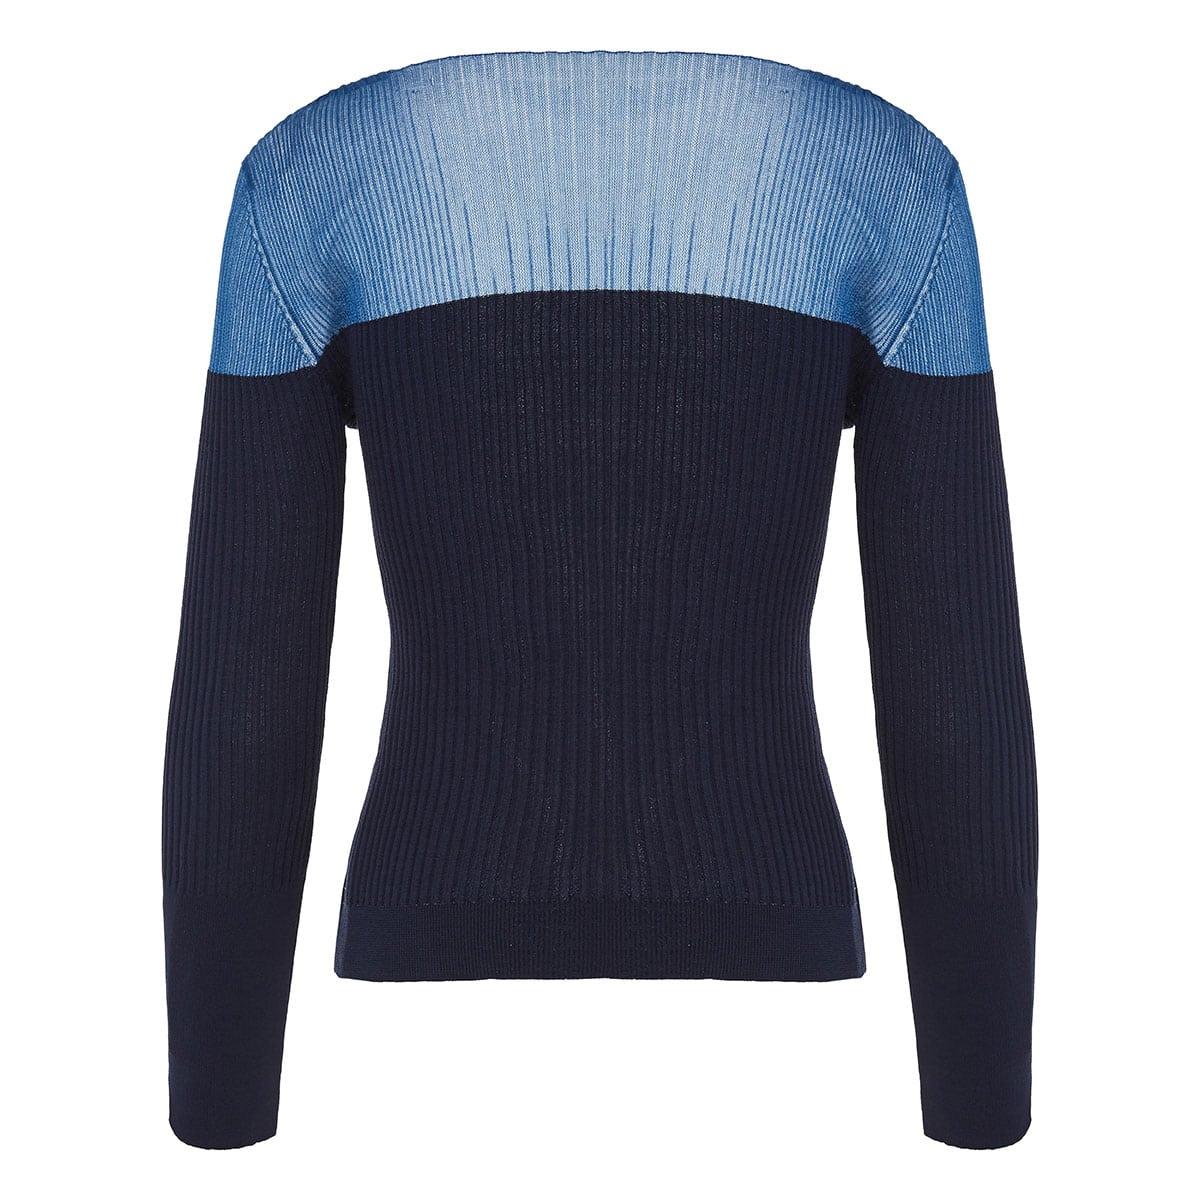 Tordu two-tone asymmetric ribbed cardigan